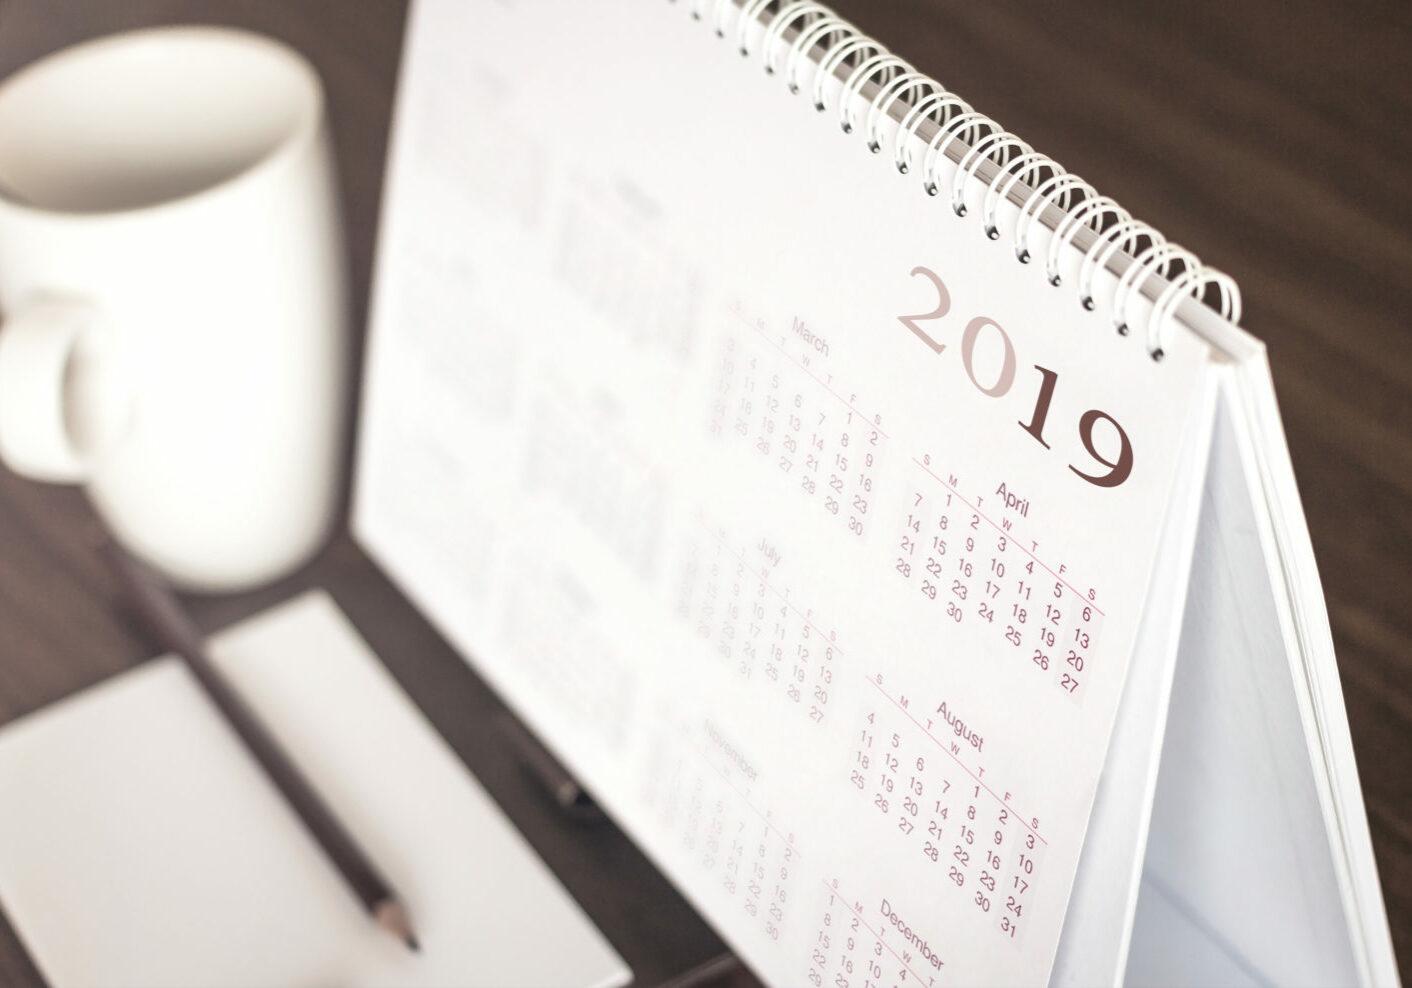 Desktop calendar sitting on desk showing year of 2019